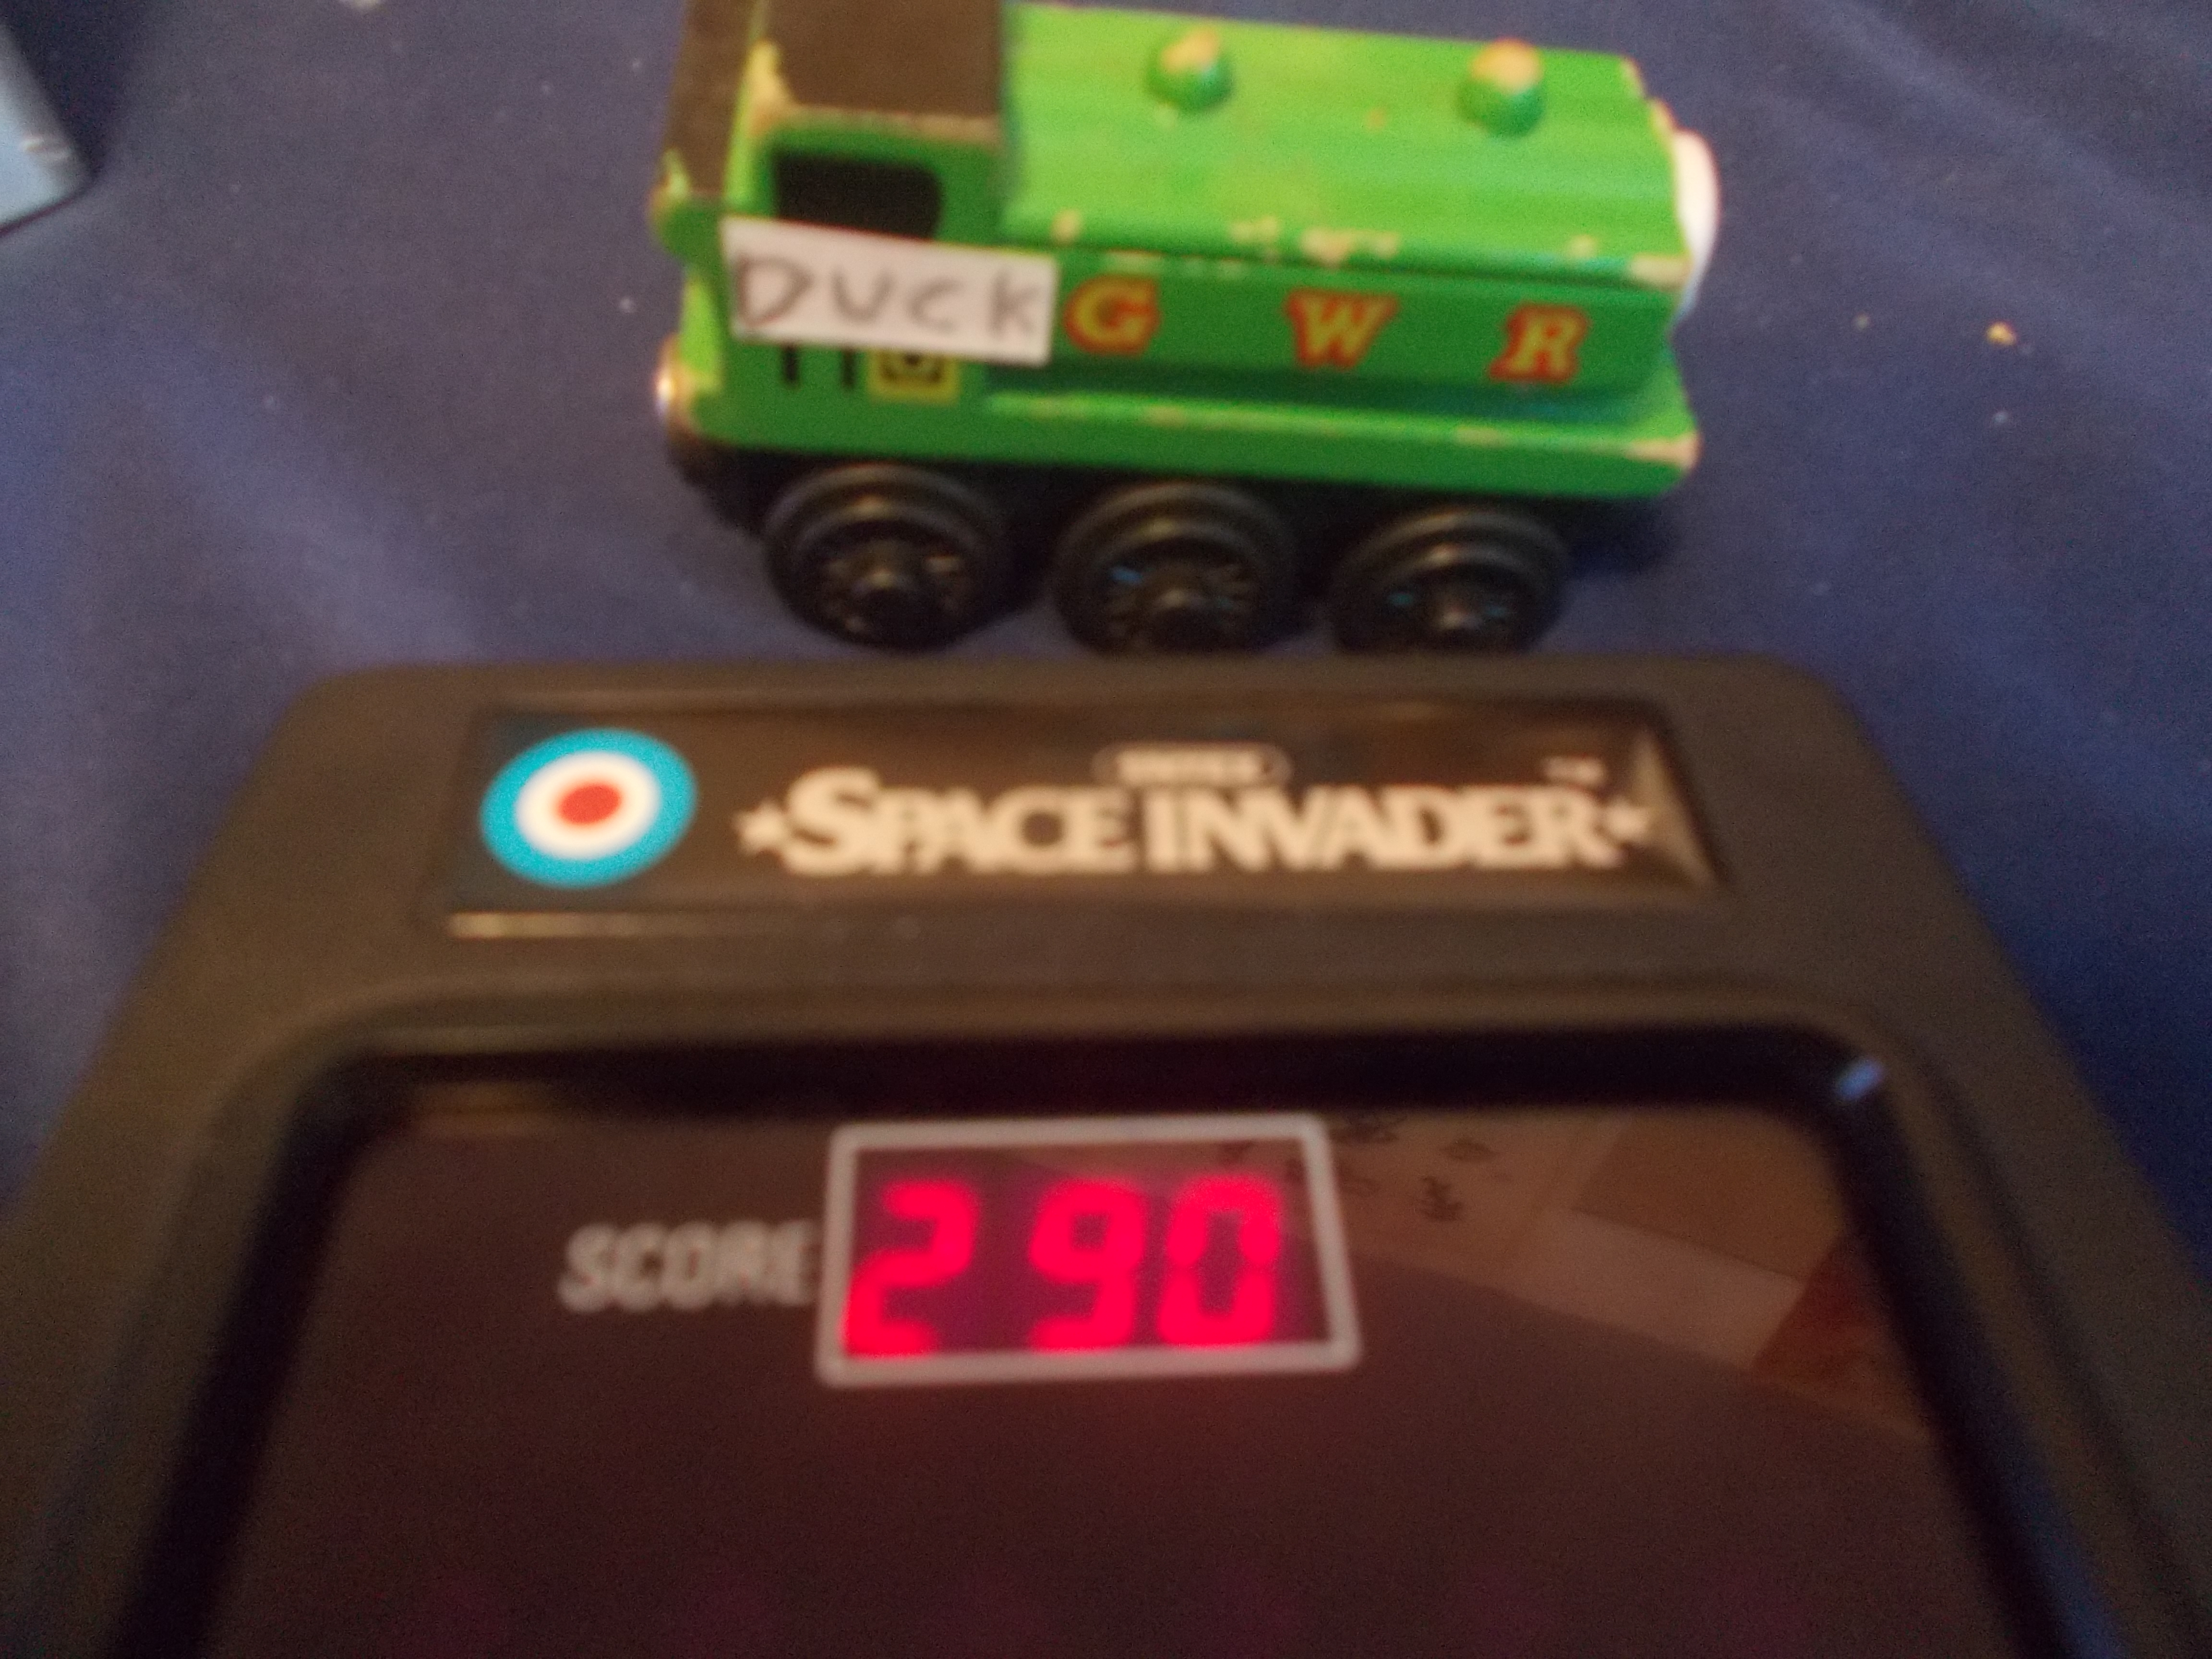 Entex Space Invader 290 points